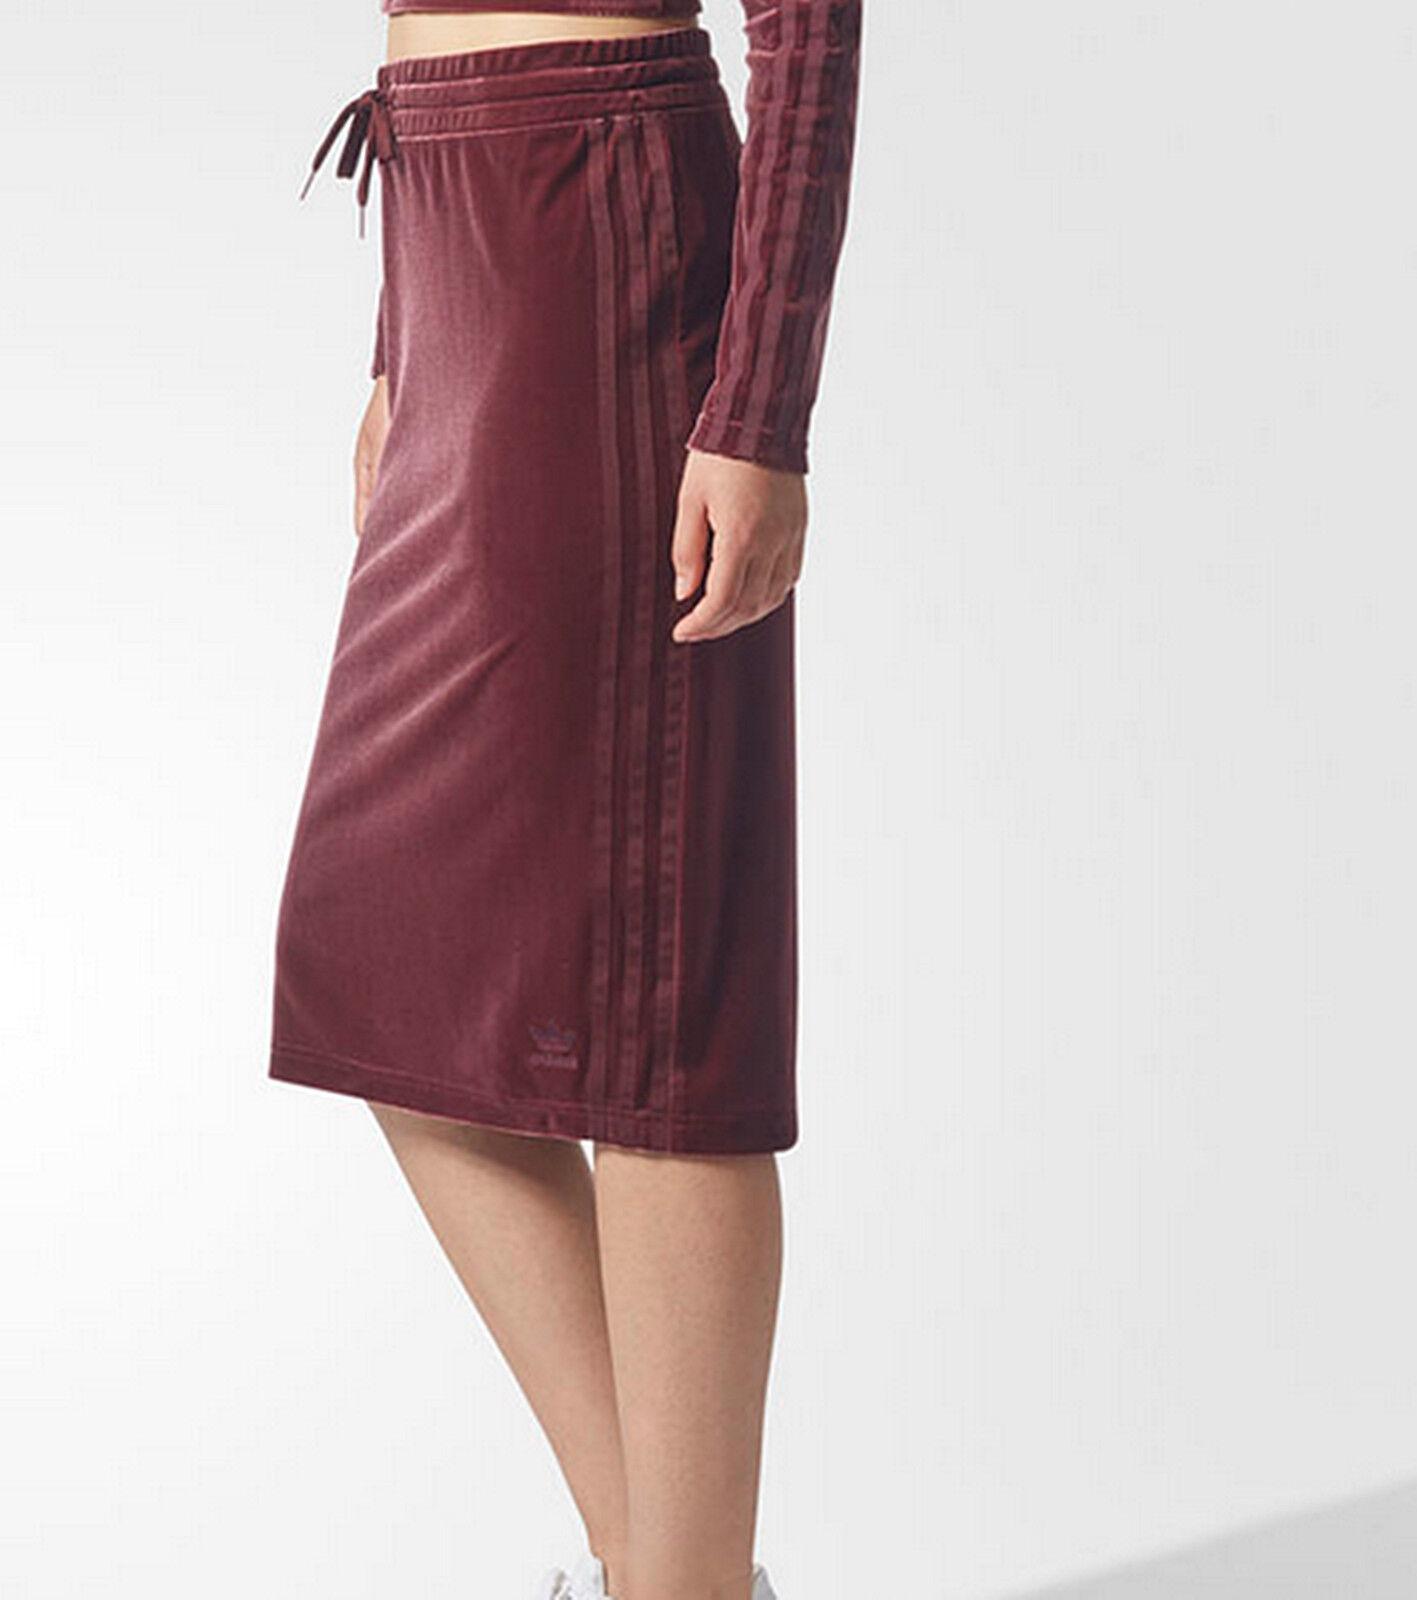 Adidas Originals Velvet Vibes Donna skirt Maroon 3 stripes trefoil sports 12 14